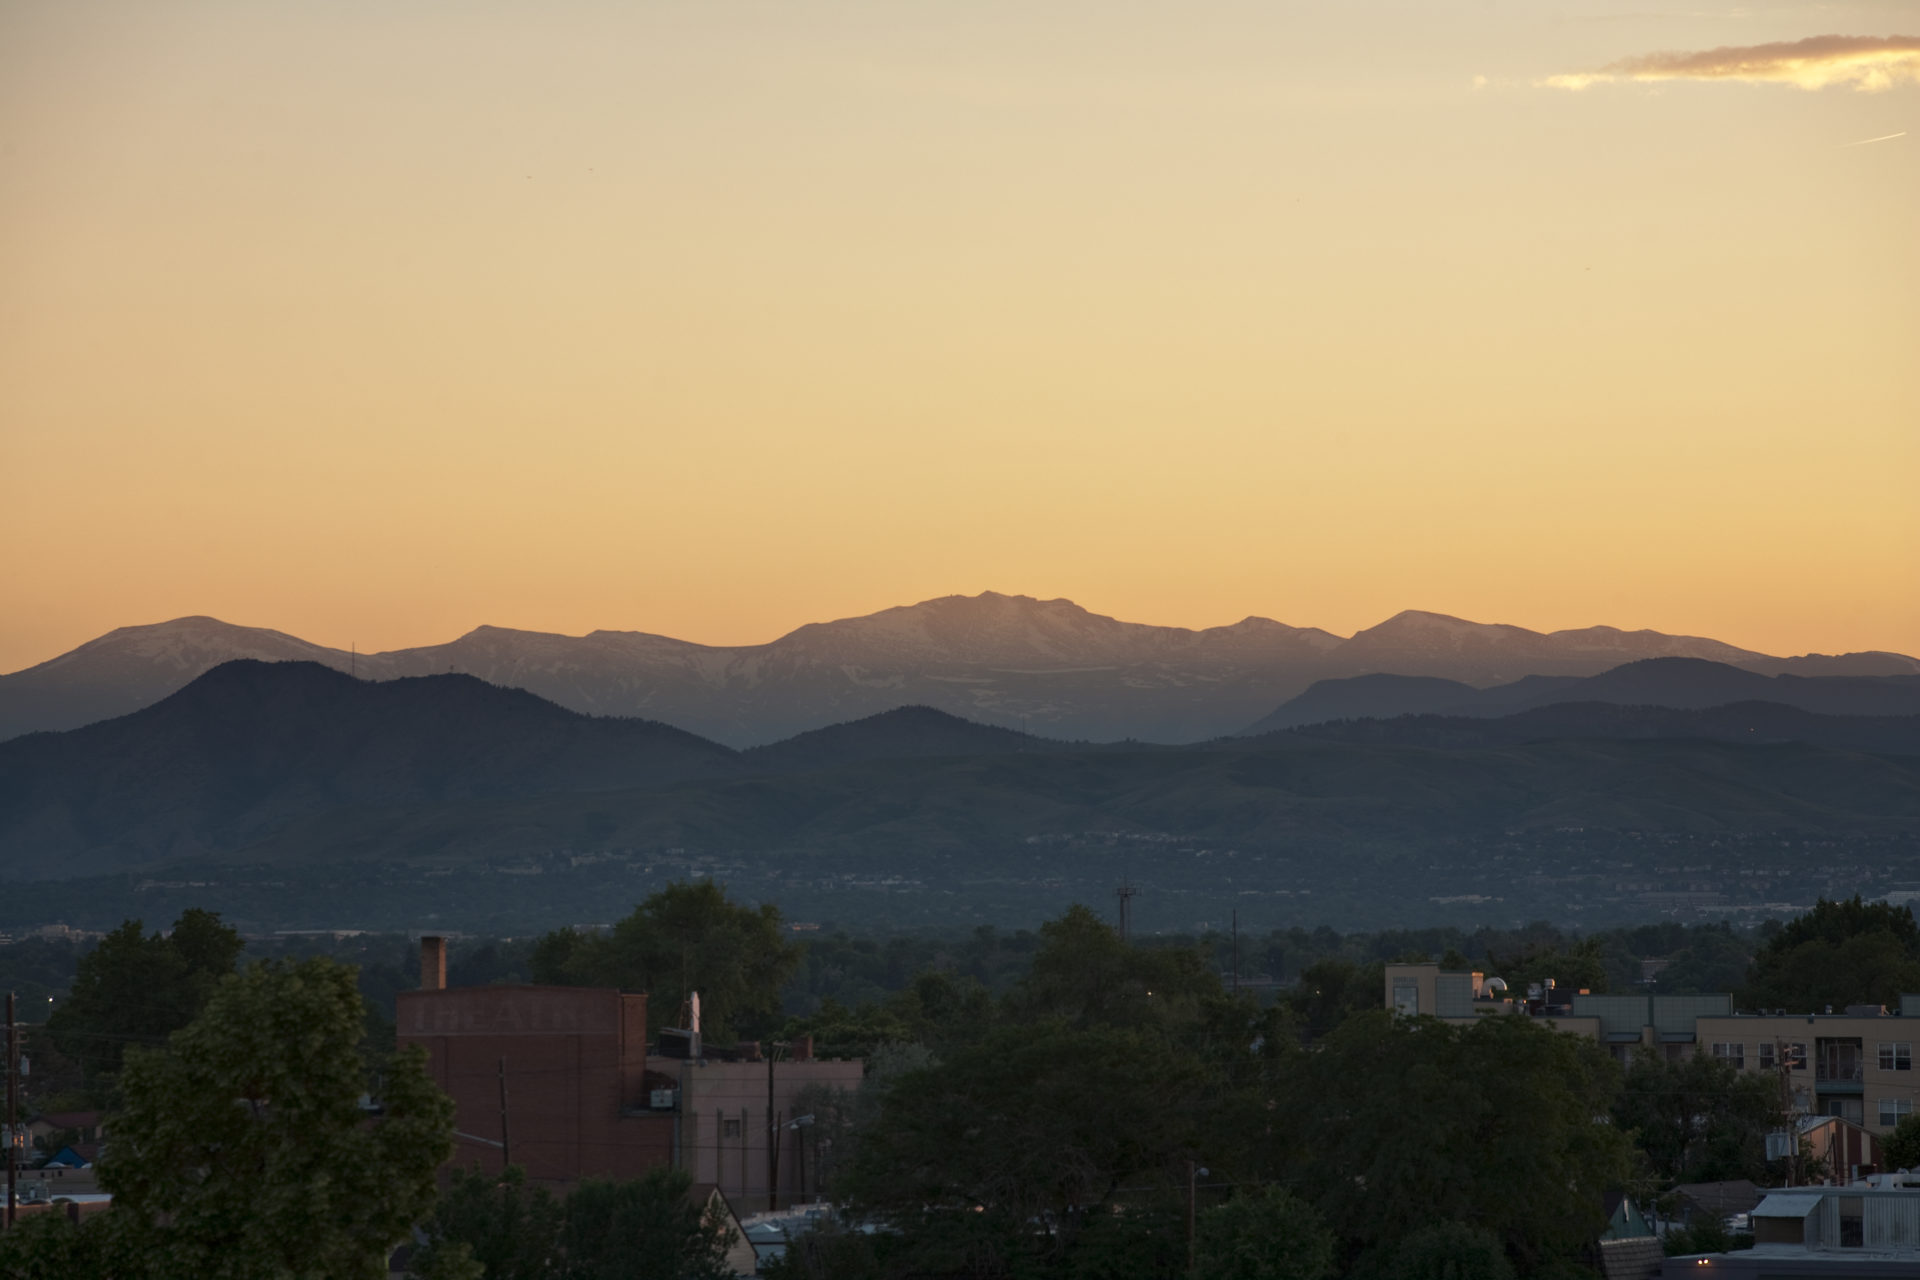 Mount Evans sunset - June 22, 2011